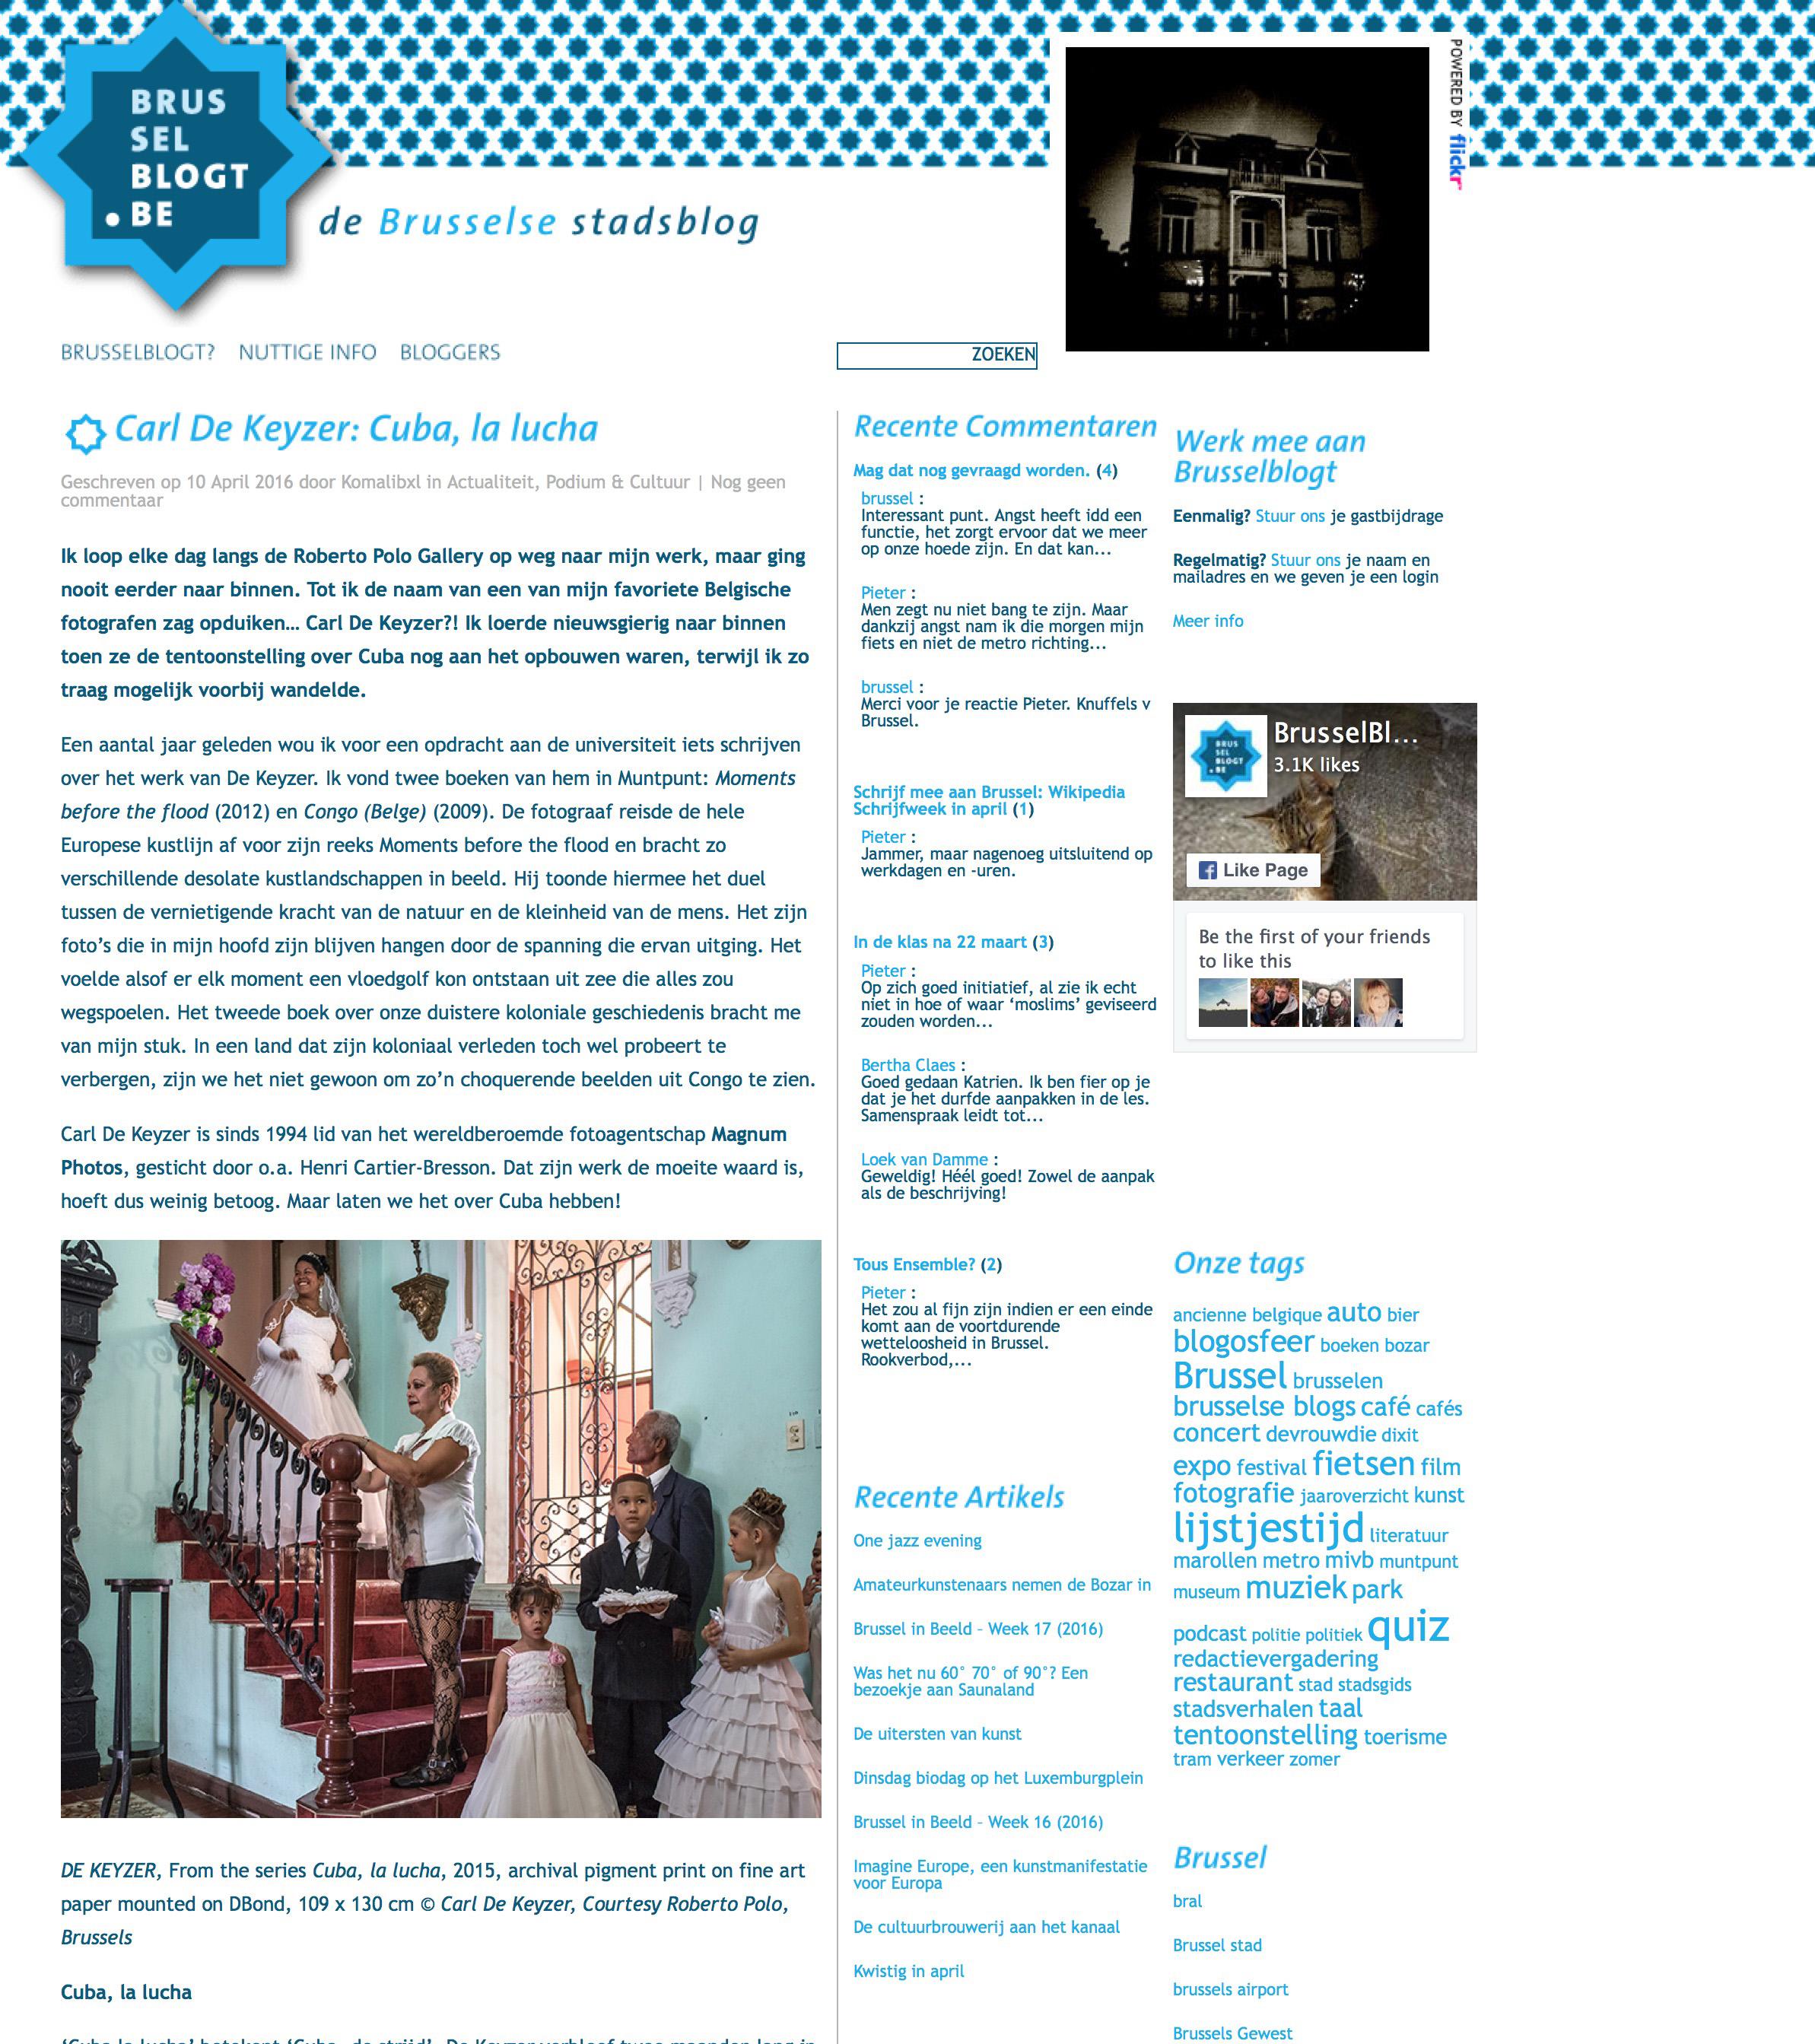 Cuba (Brussels blog)